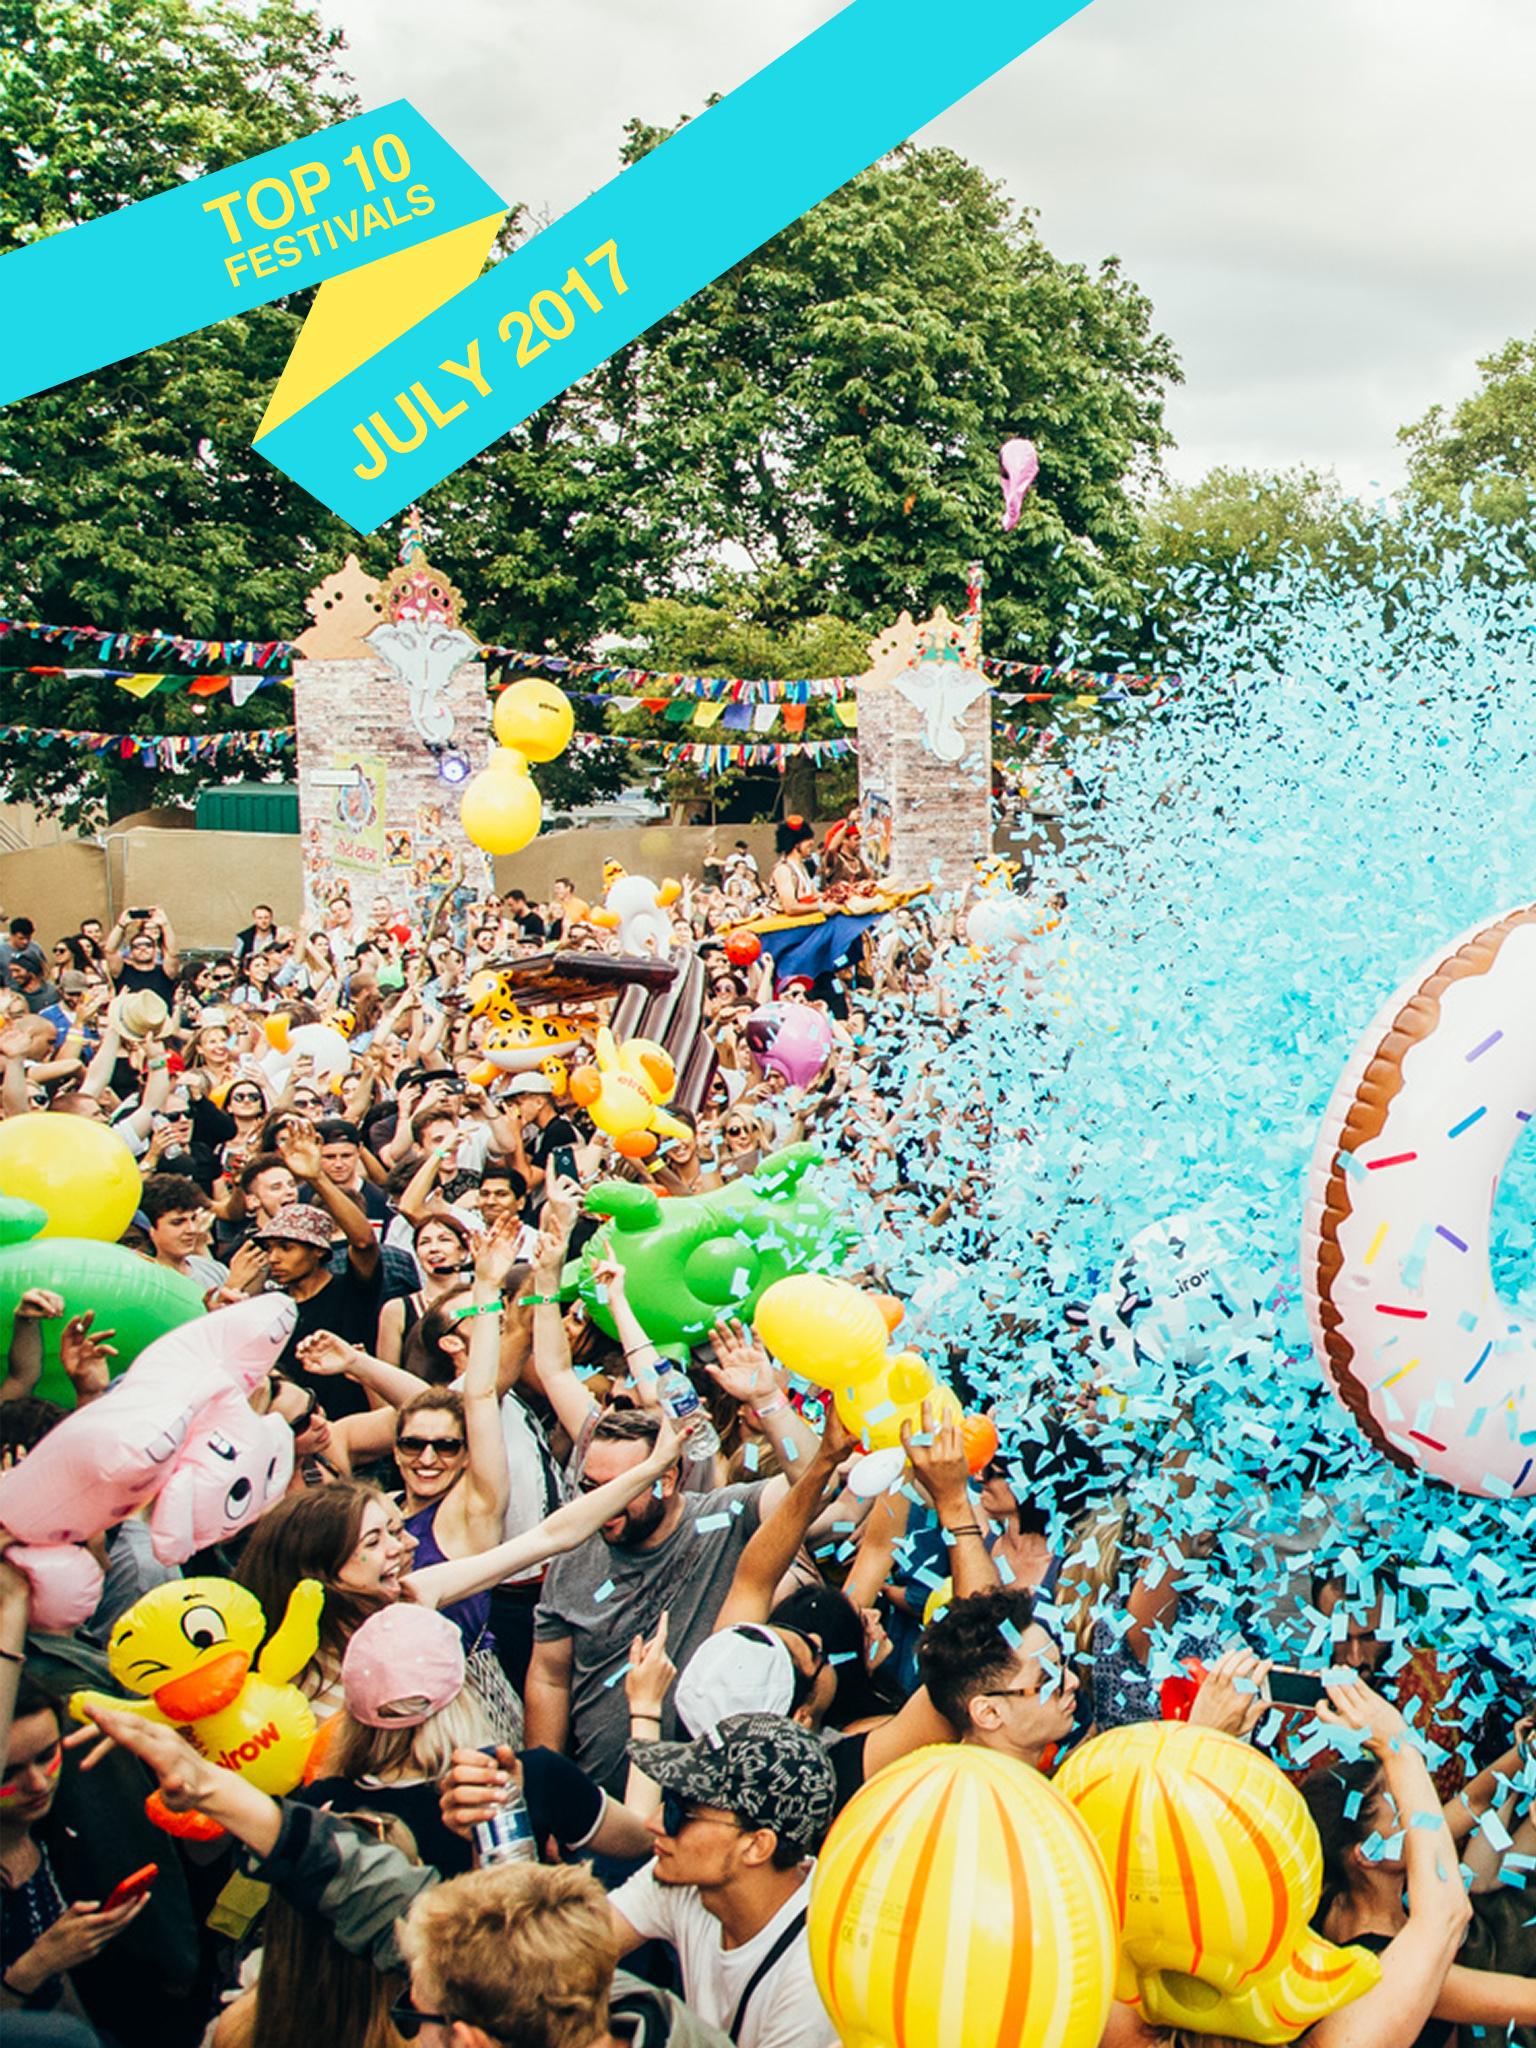 Top 10 July 2017 Festivals